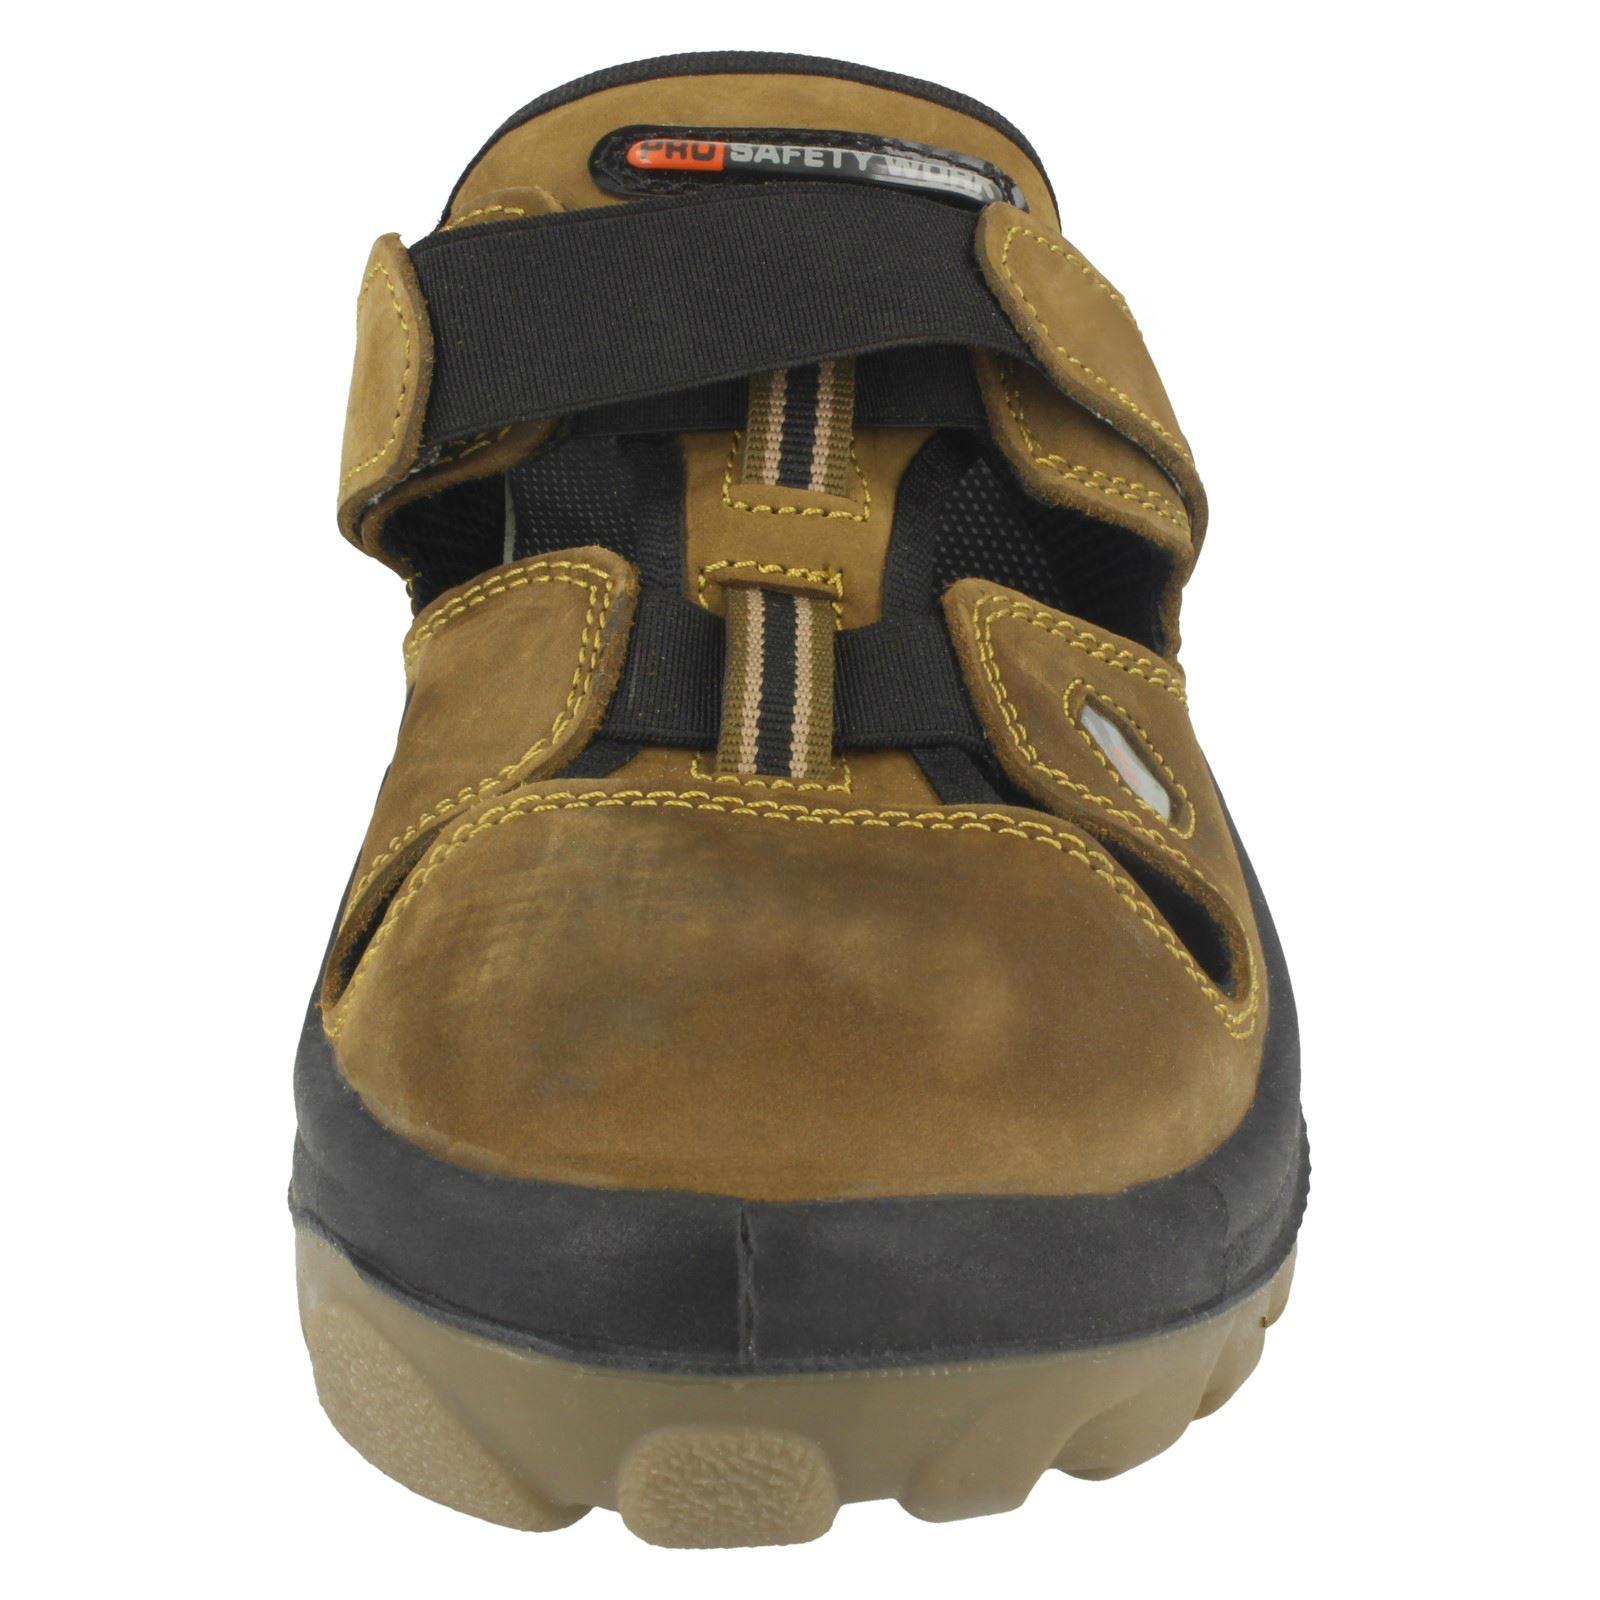 mens pro safety work clog safety shoes ebay